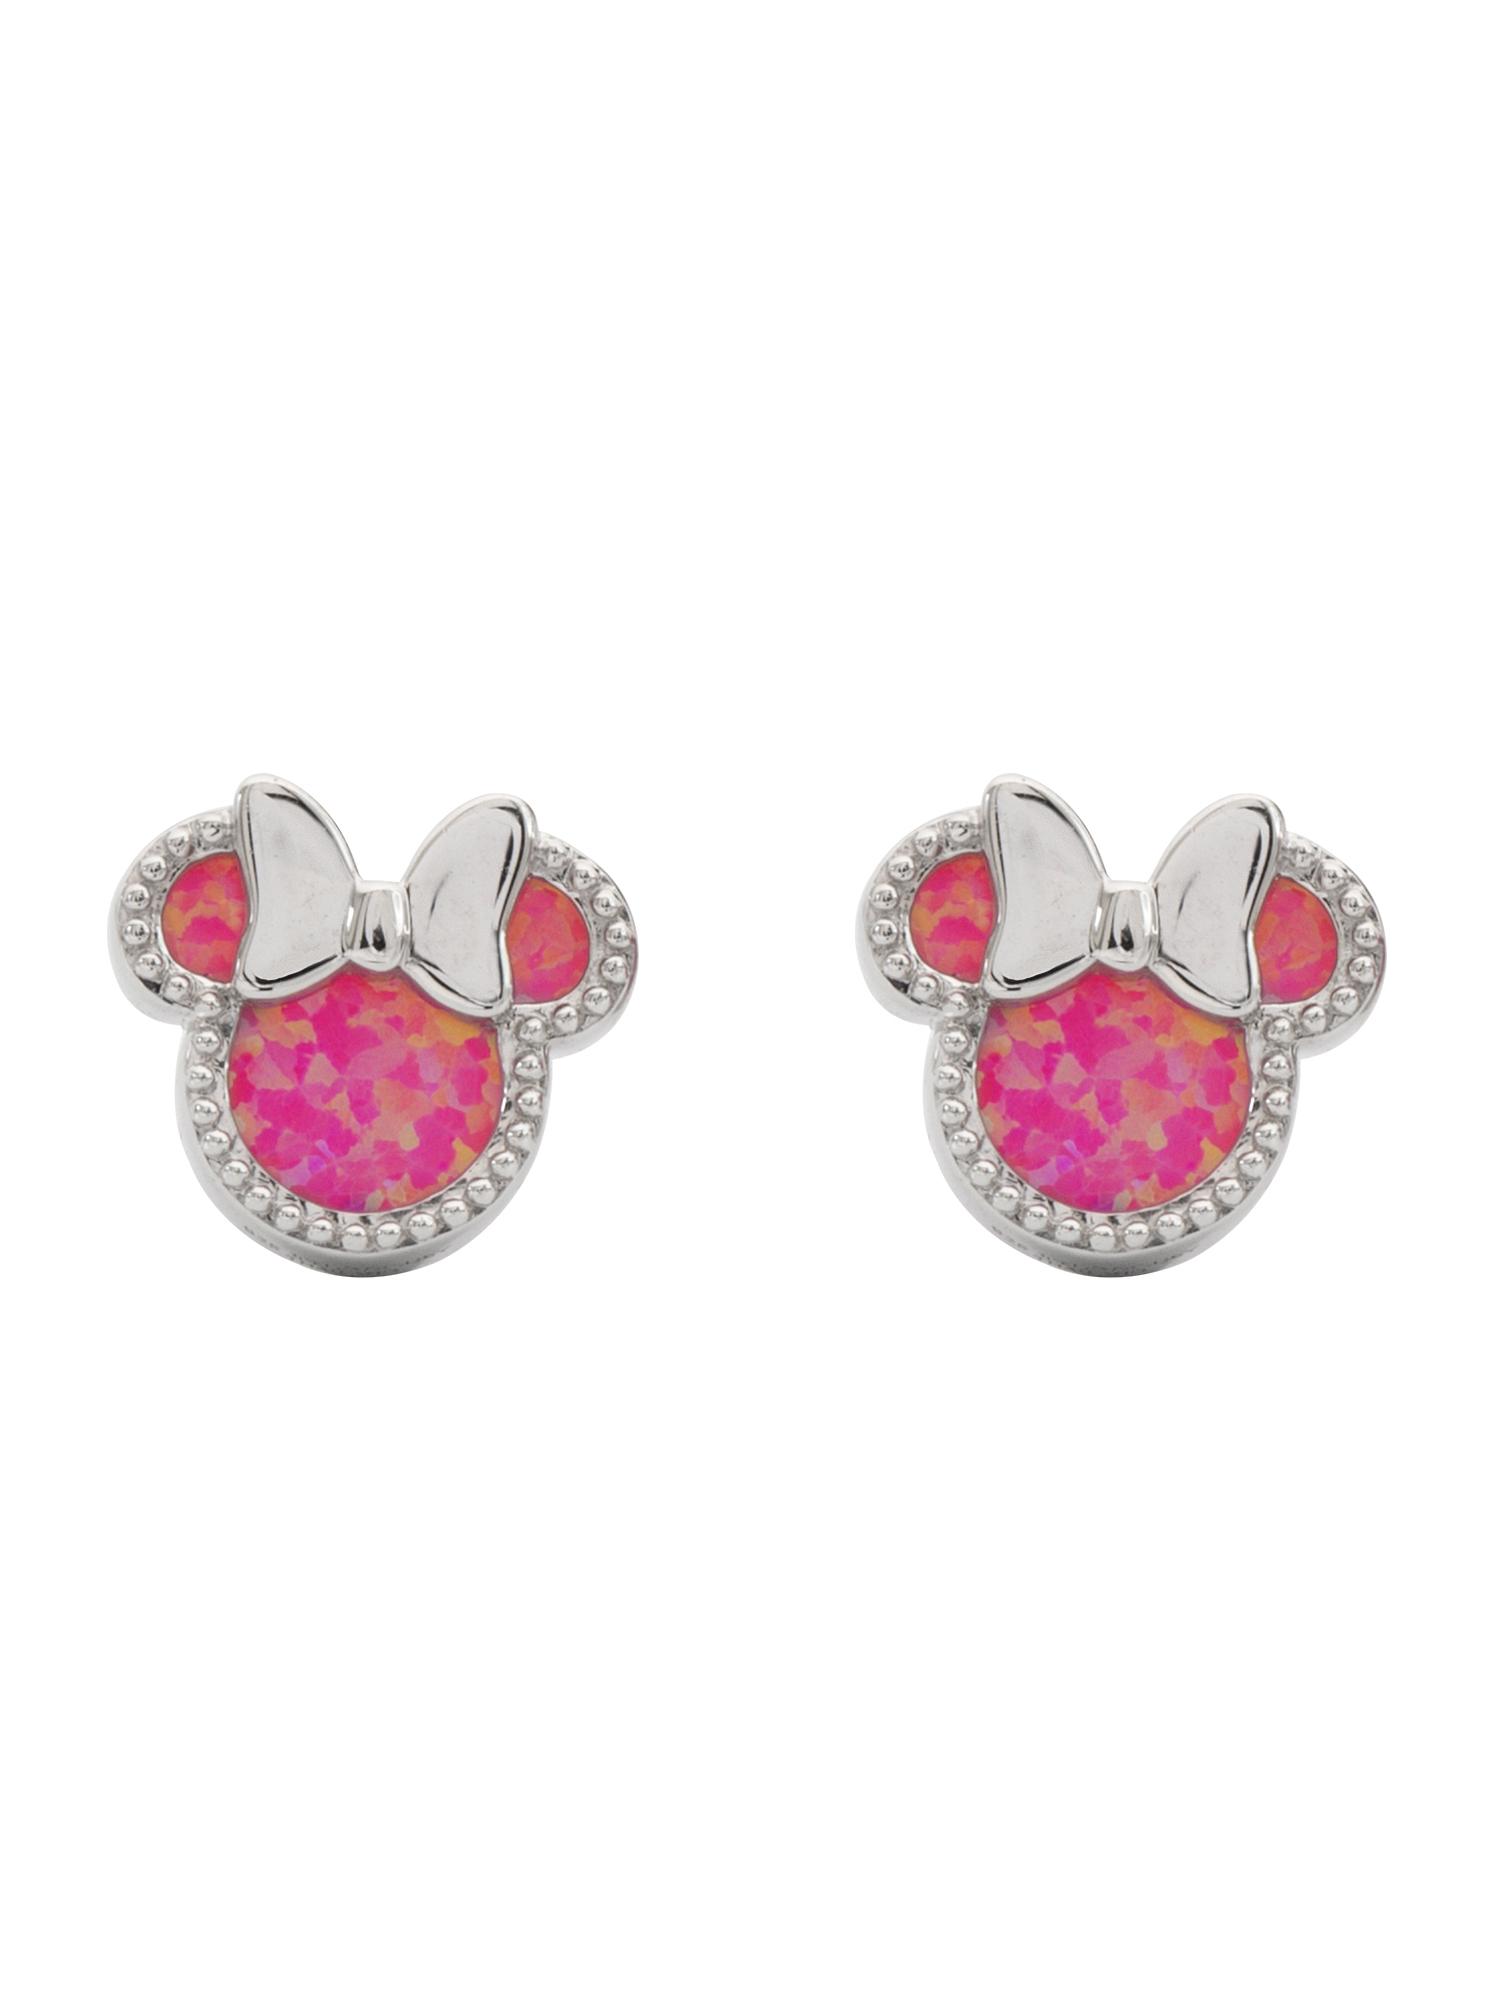 Disney Minnie Mouse Sterling Silver Pink Opal Stud Earrings